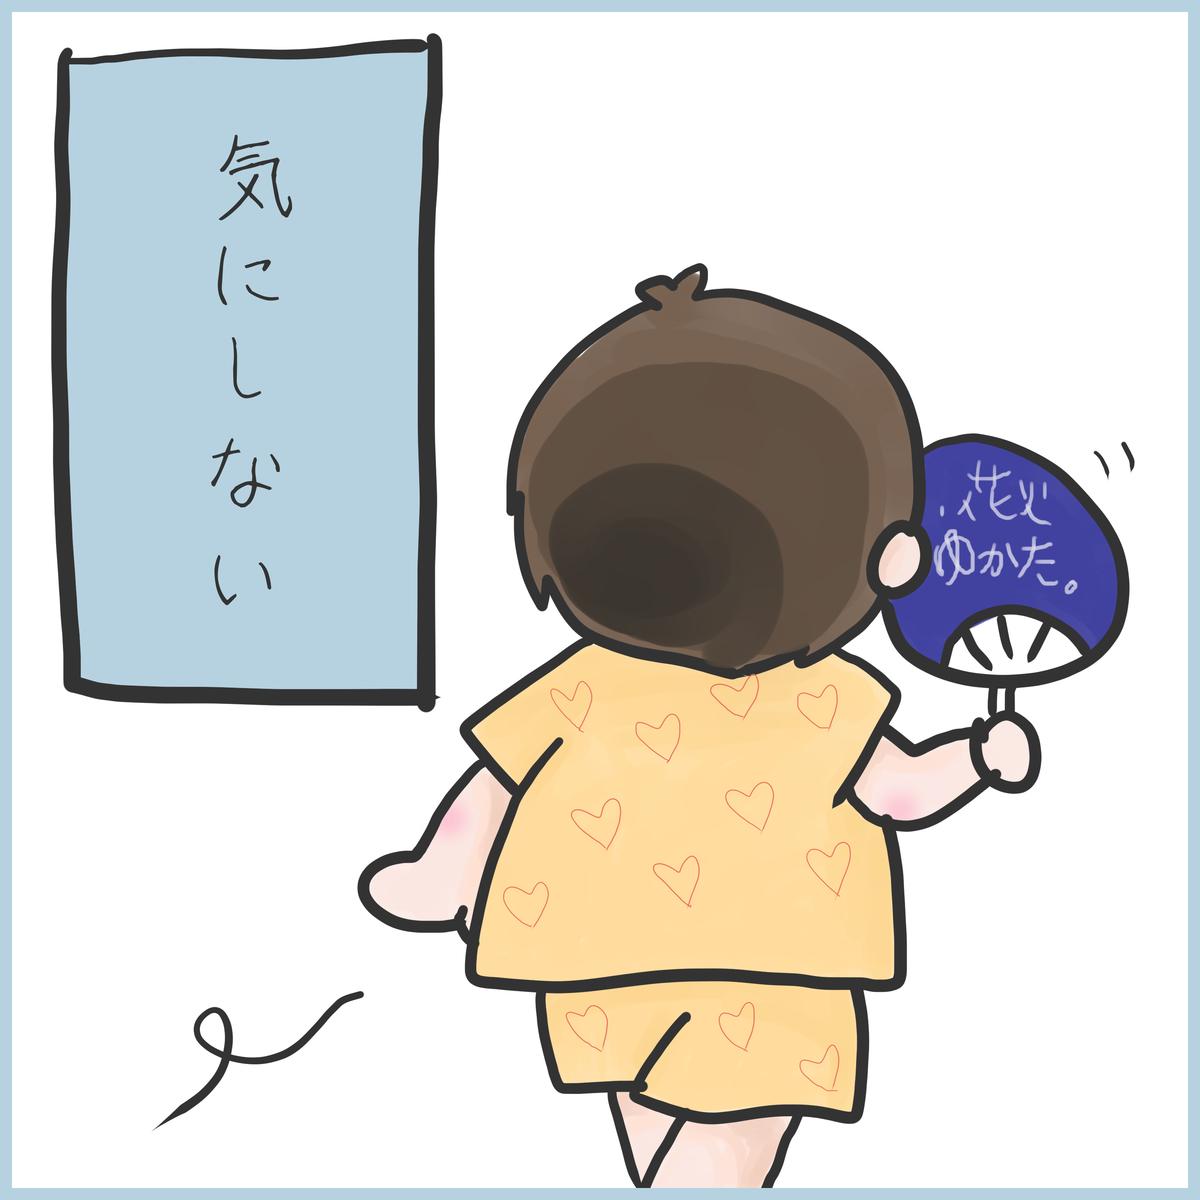 f:id:ika_yoshi:20201102231106j:plain